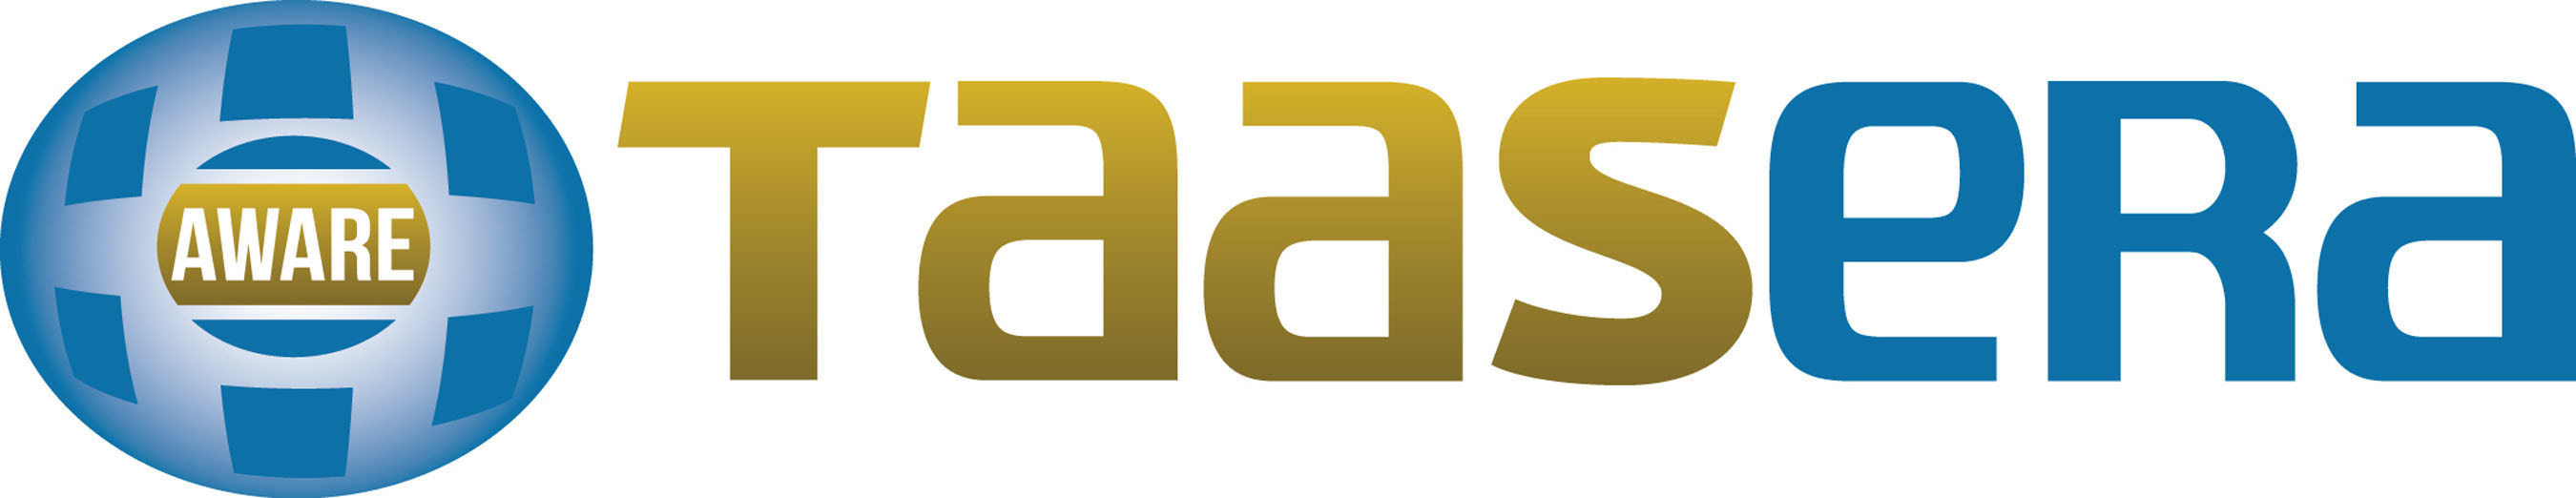 TaaSera logo